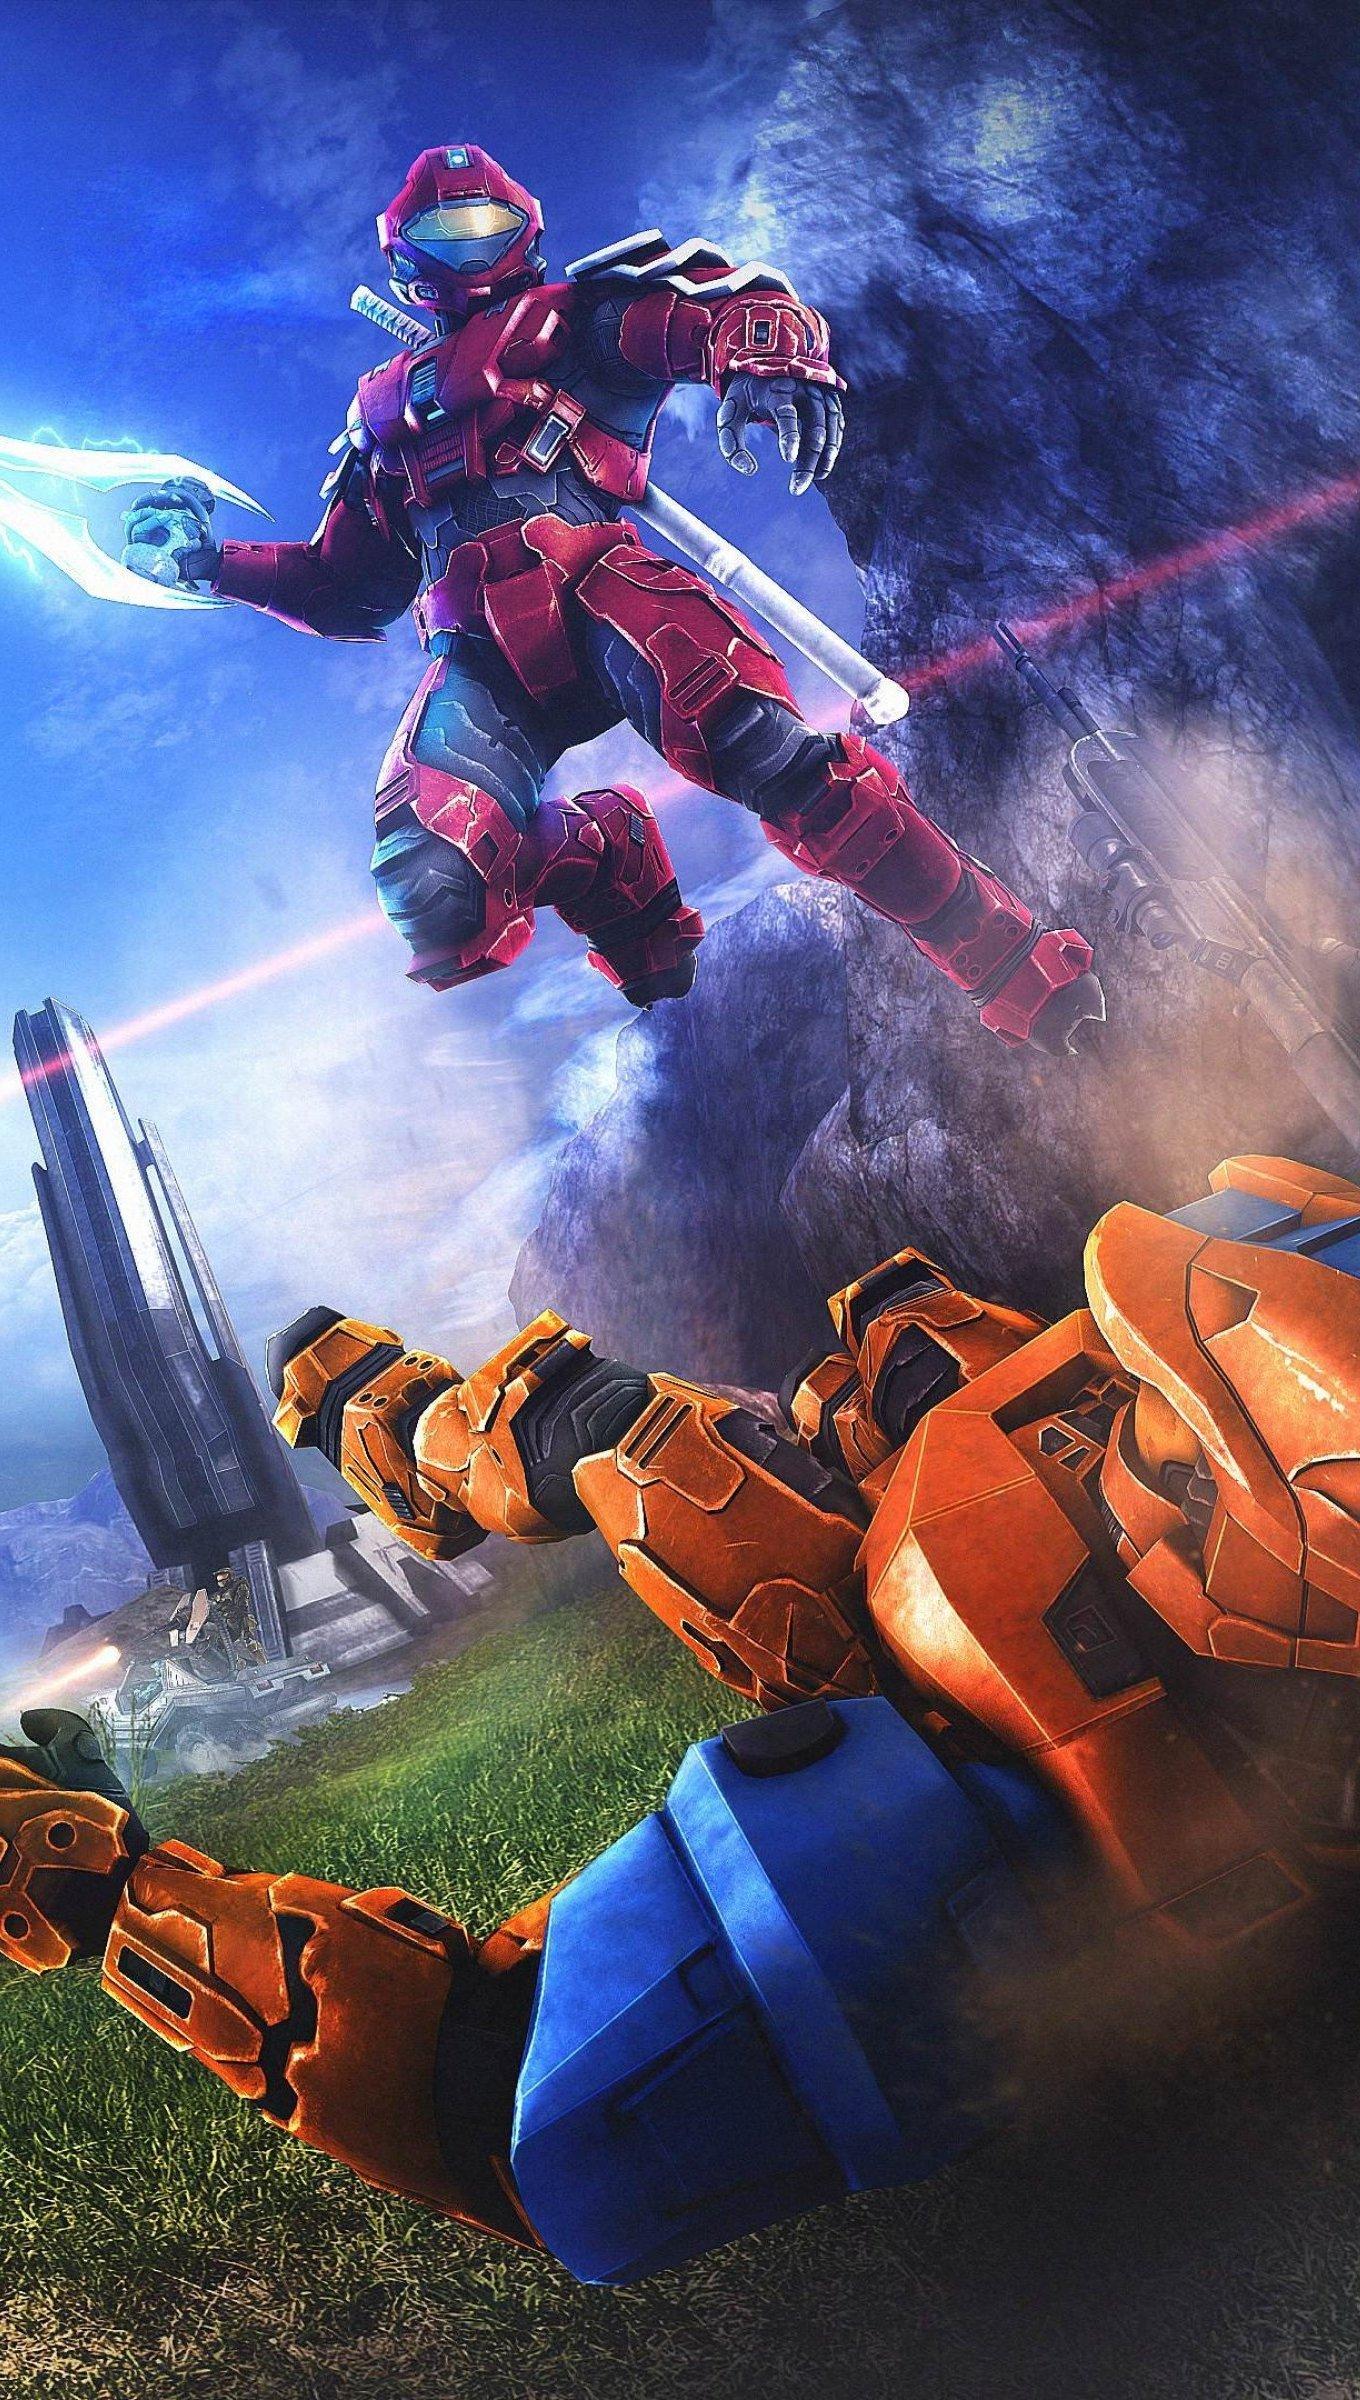 Wallpaper Videogame Halo Vertical